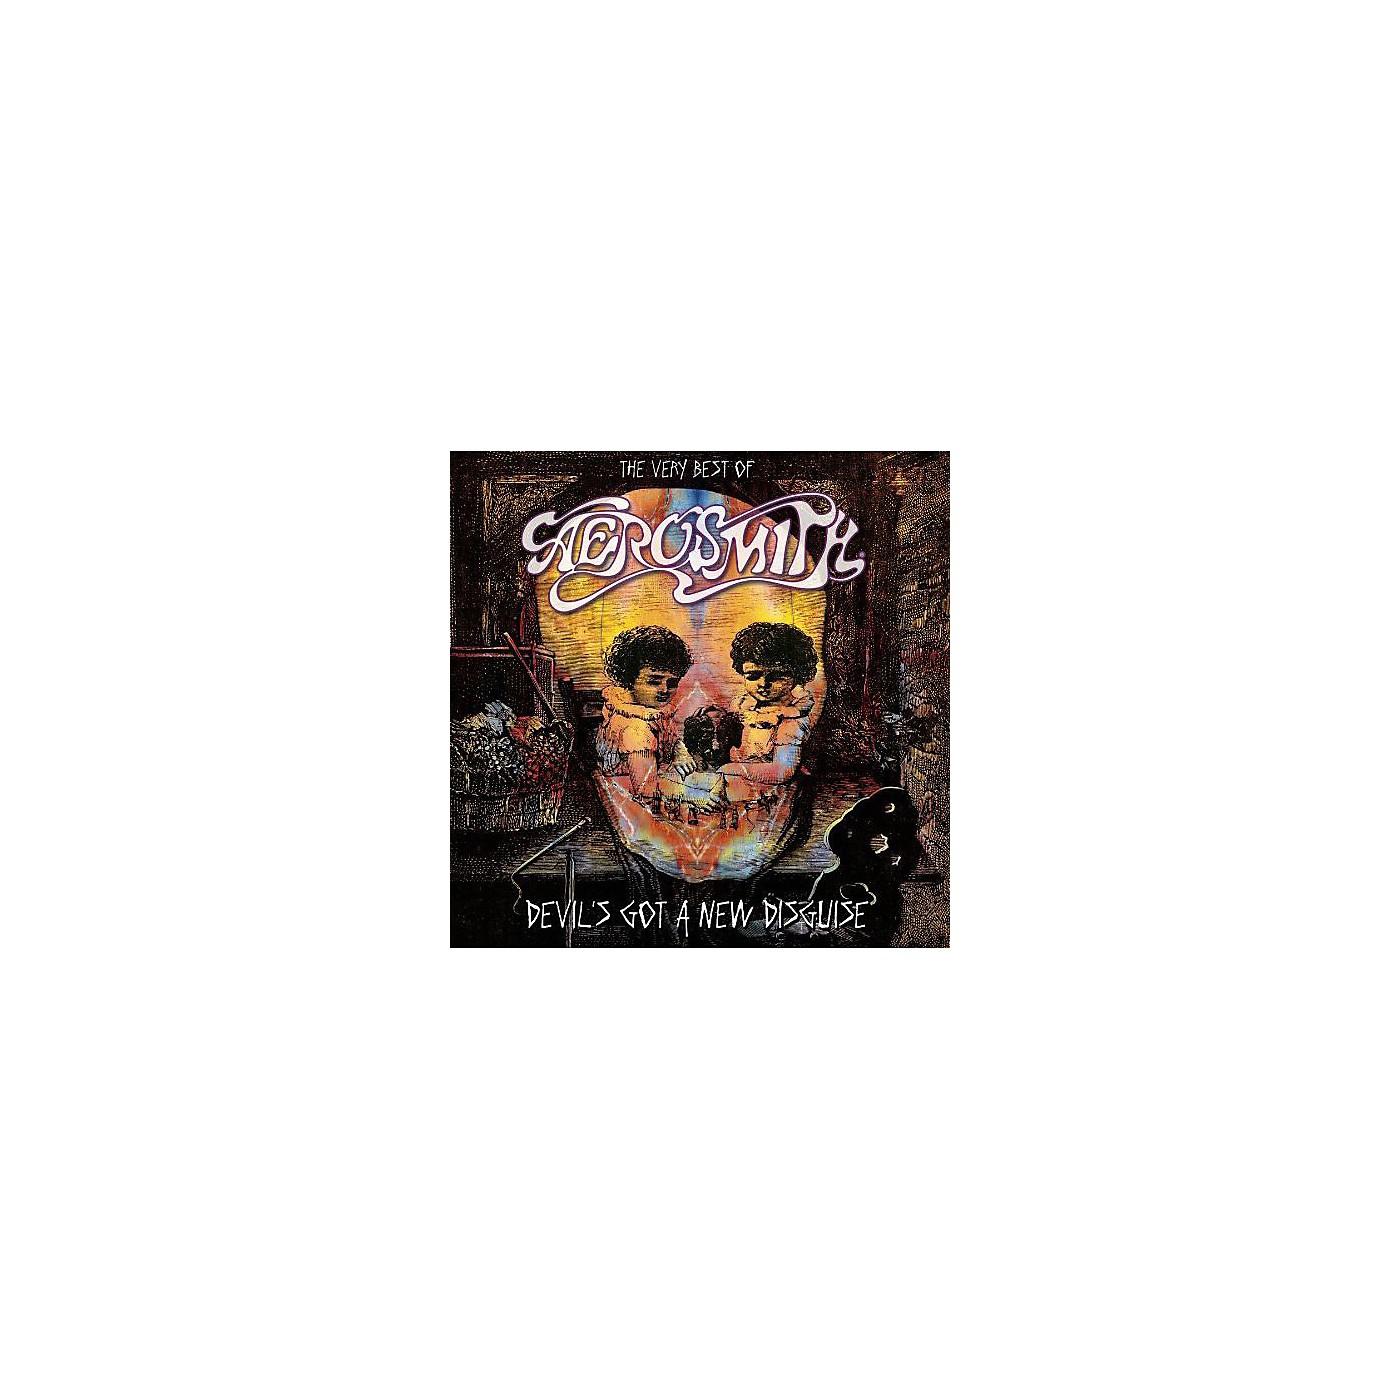 Alliance Aerosmith - Devil's Got A New Disguise: The Very Best Of Aerosmith (CD) thumbnail